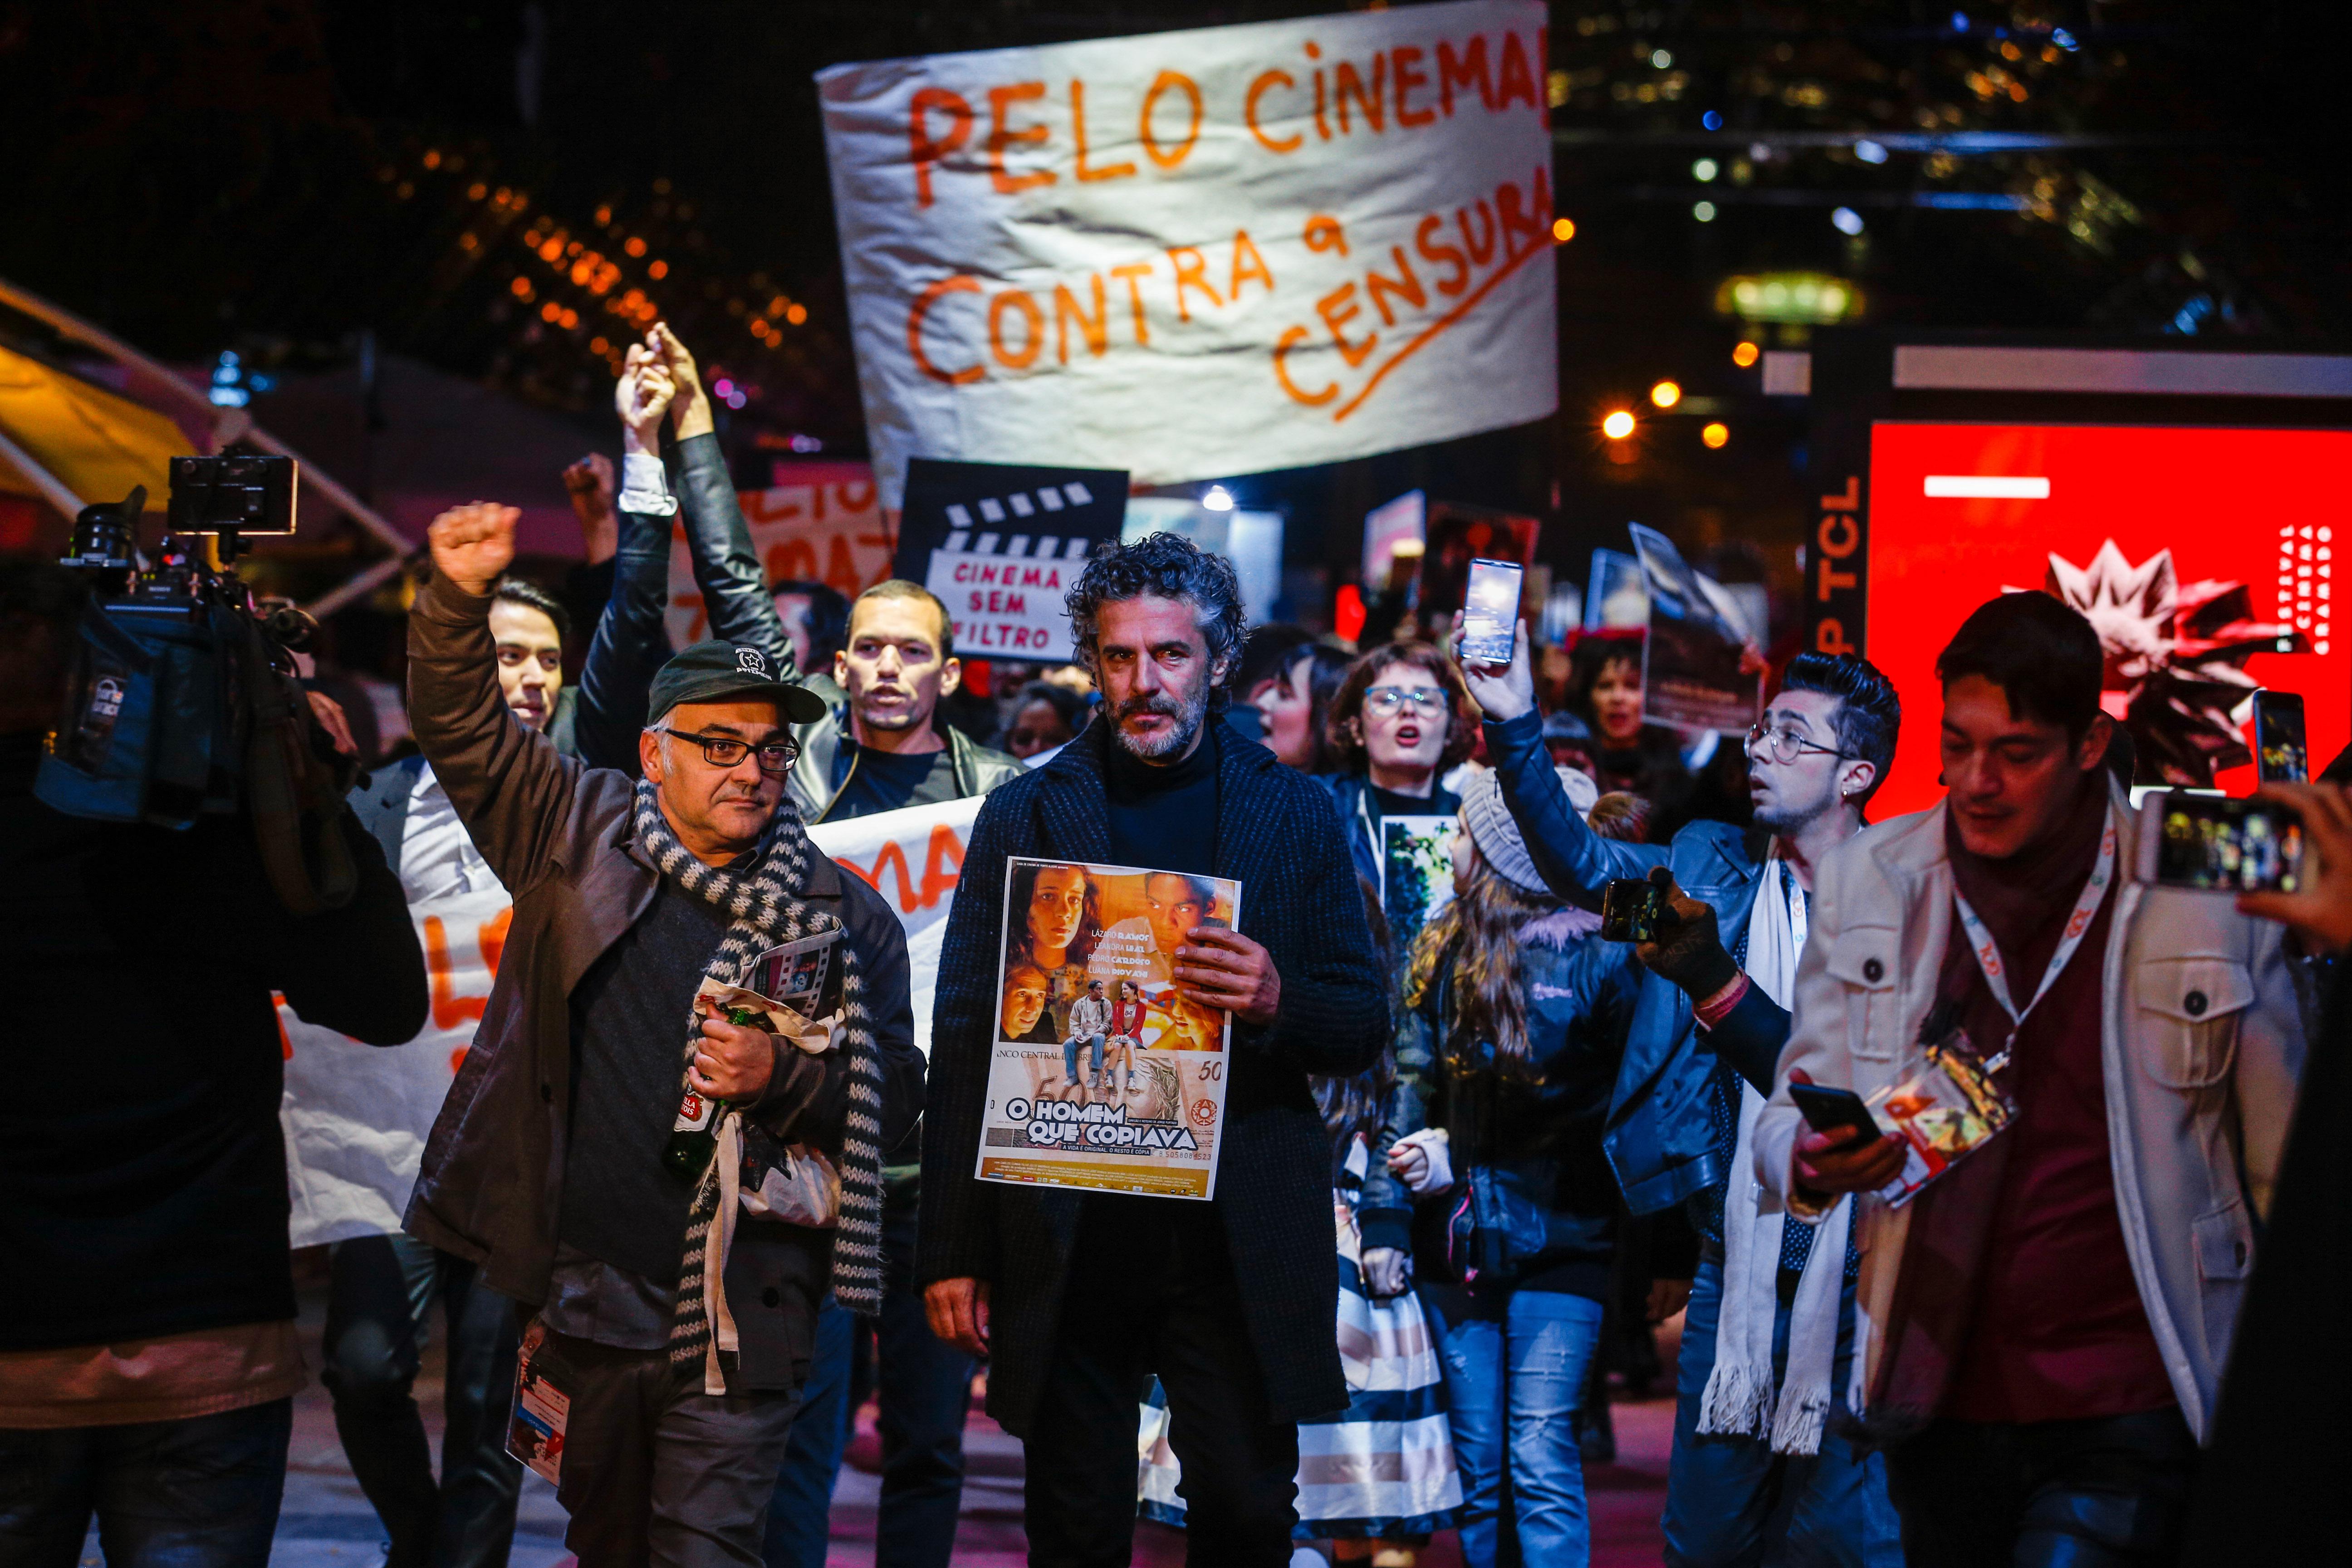 PROTESTO DE ARTISTAS NO FESTIVAL DE CINEMA É MARCADO POR INSULTOS